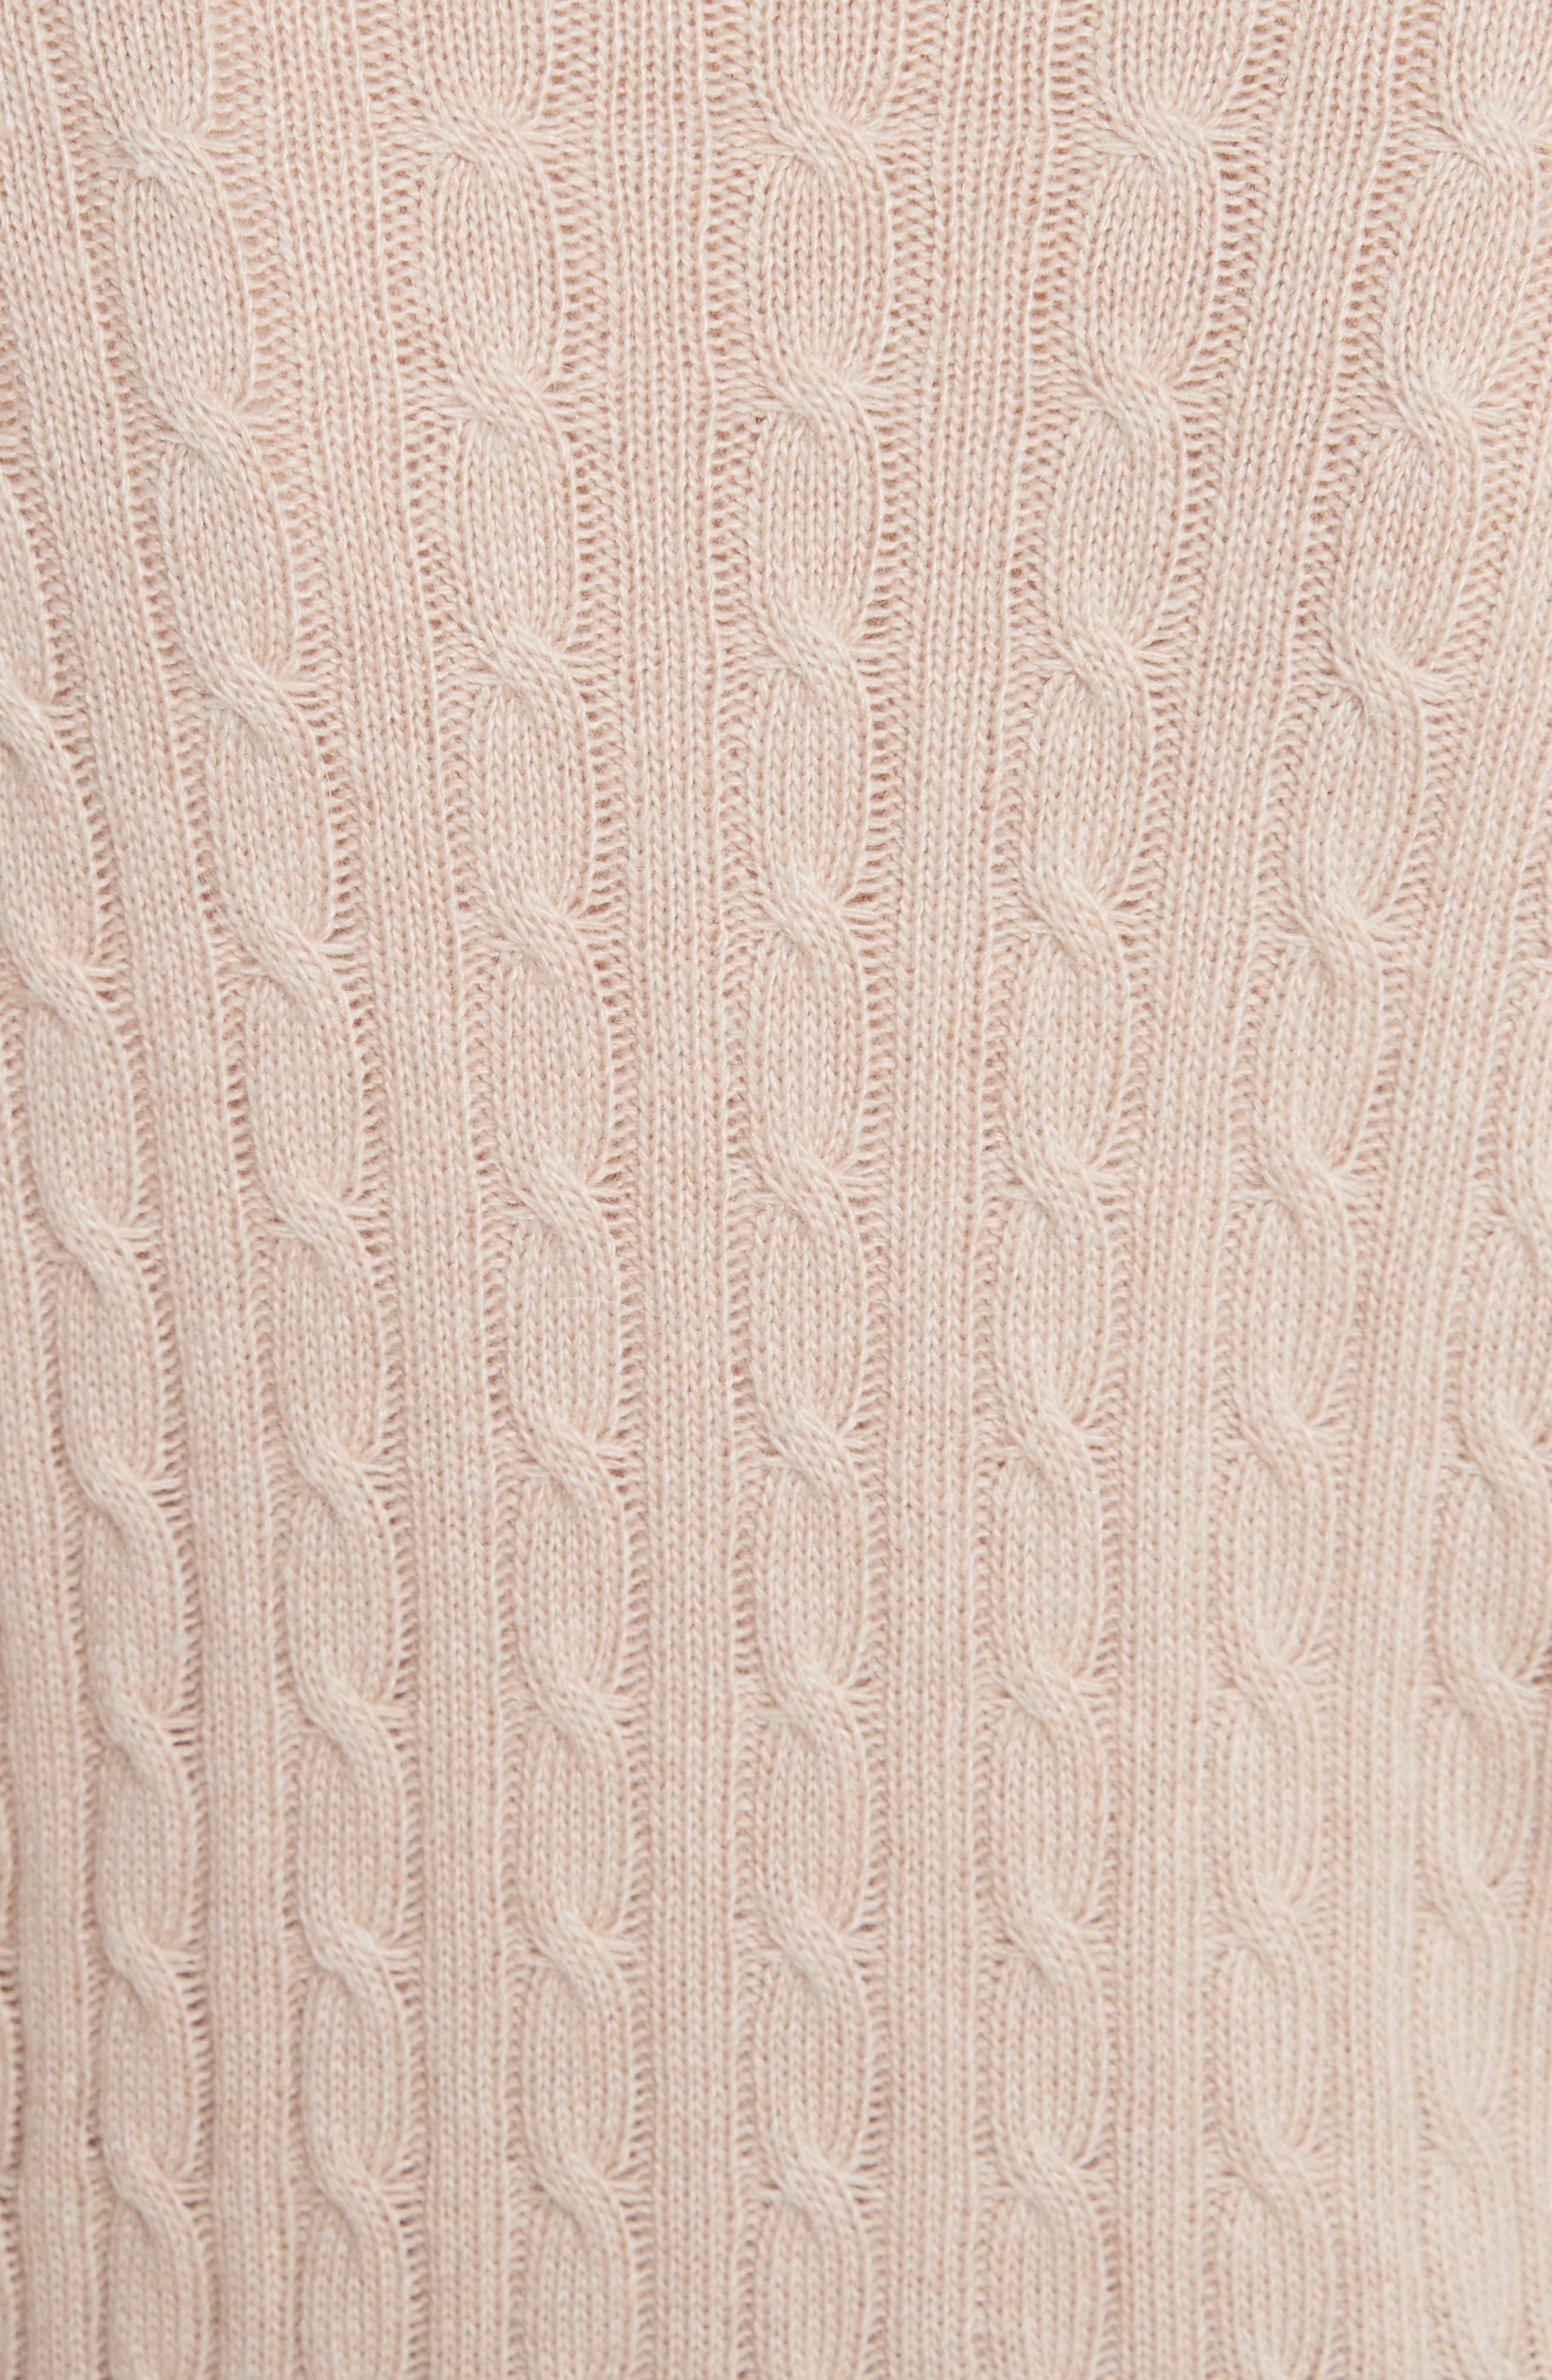 Printed Wool & Angora Blend Sweater,                             Alternate thumbnail 5, color,